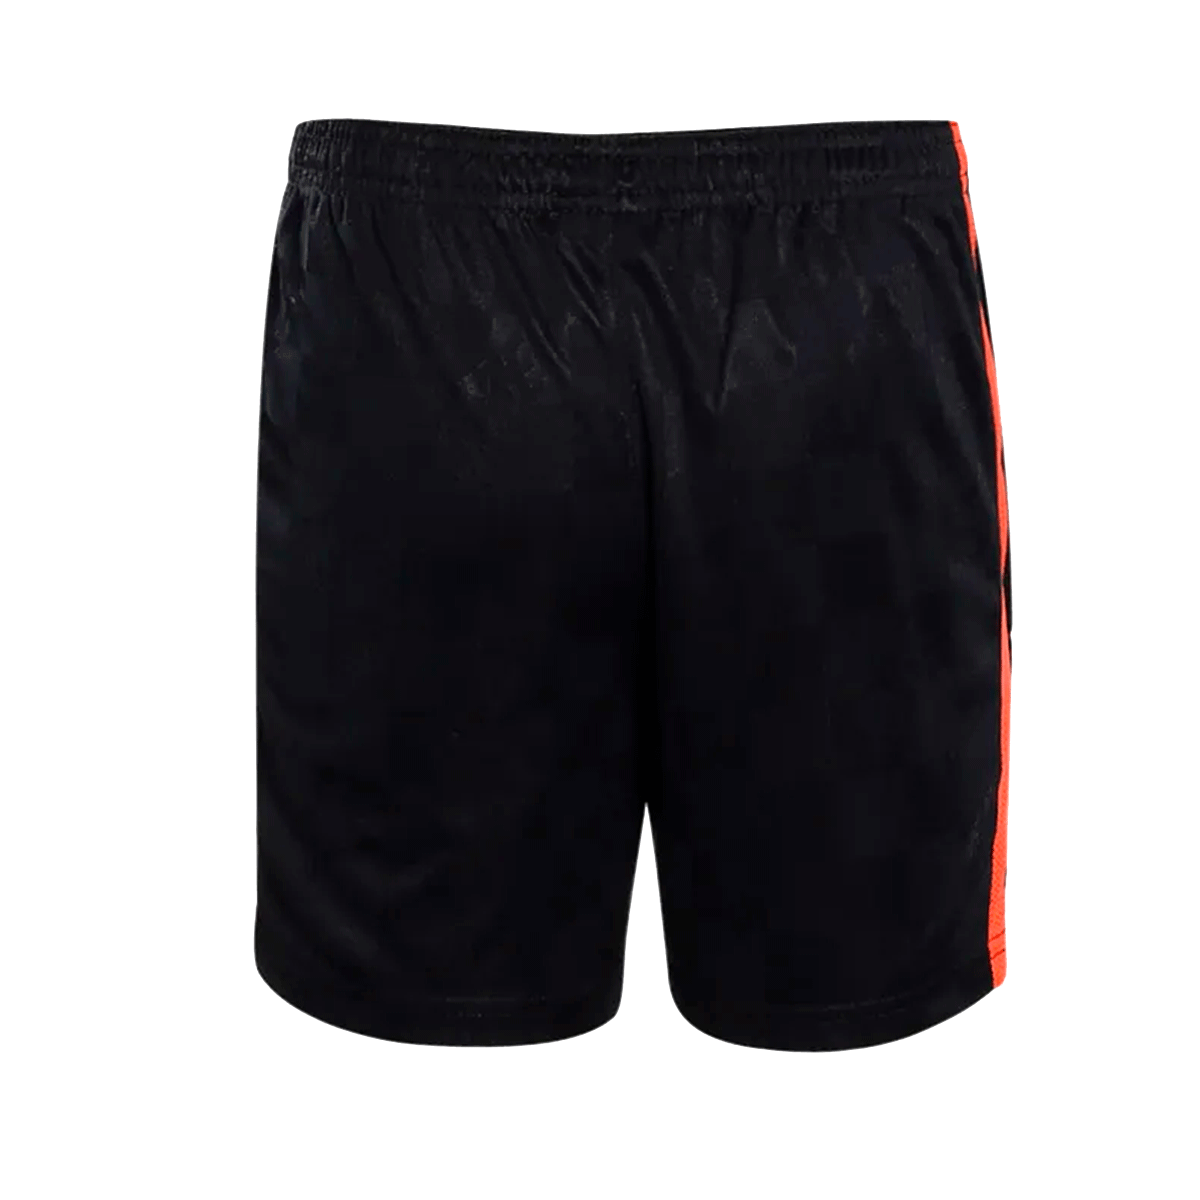 Shorts Nike Breathe Academy Masculino Preto Laranja